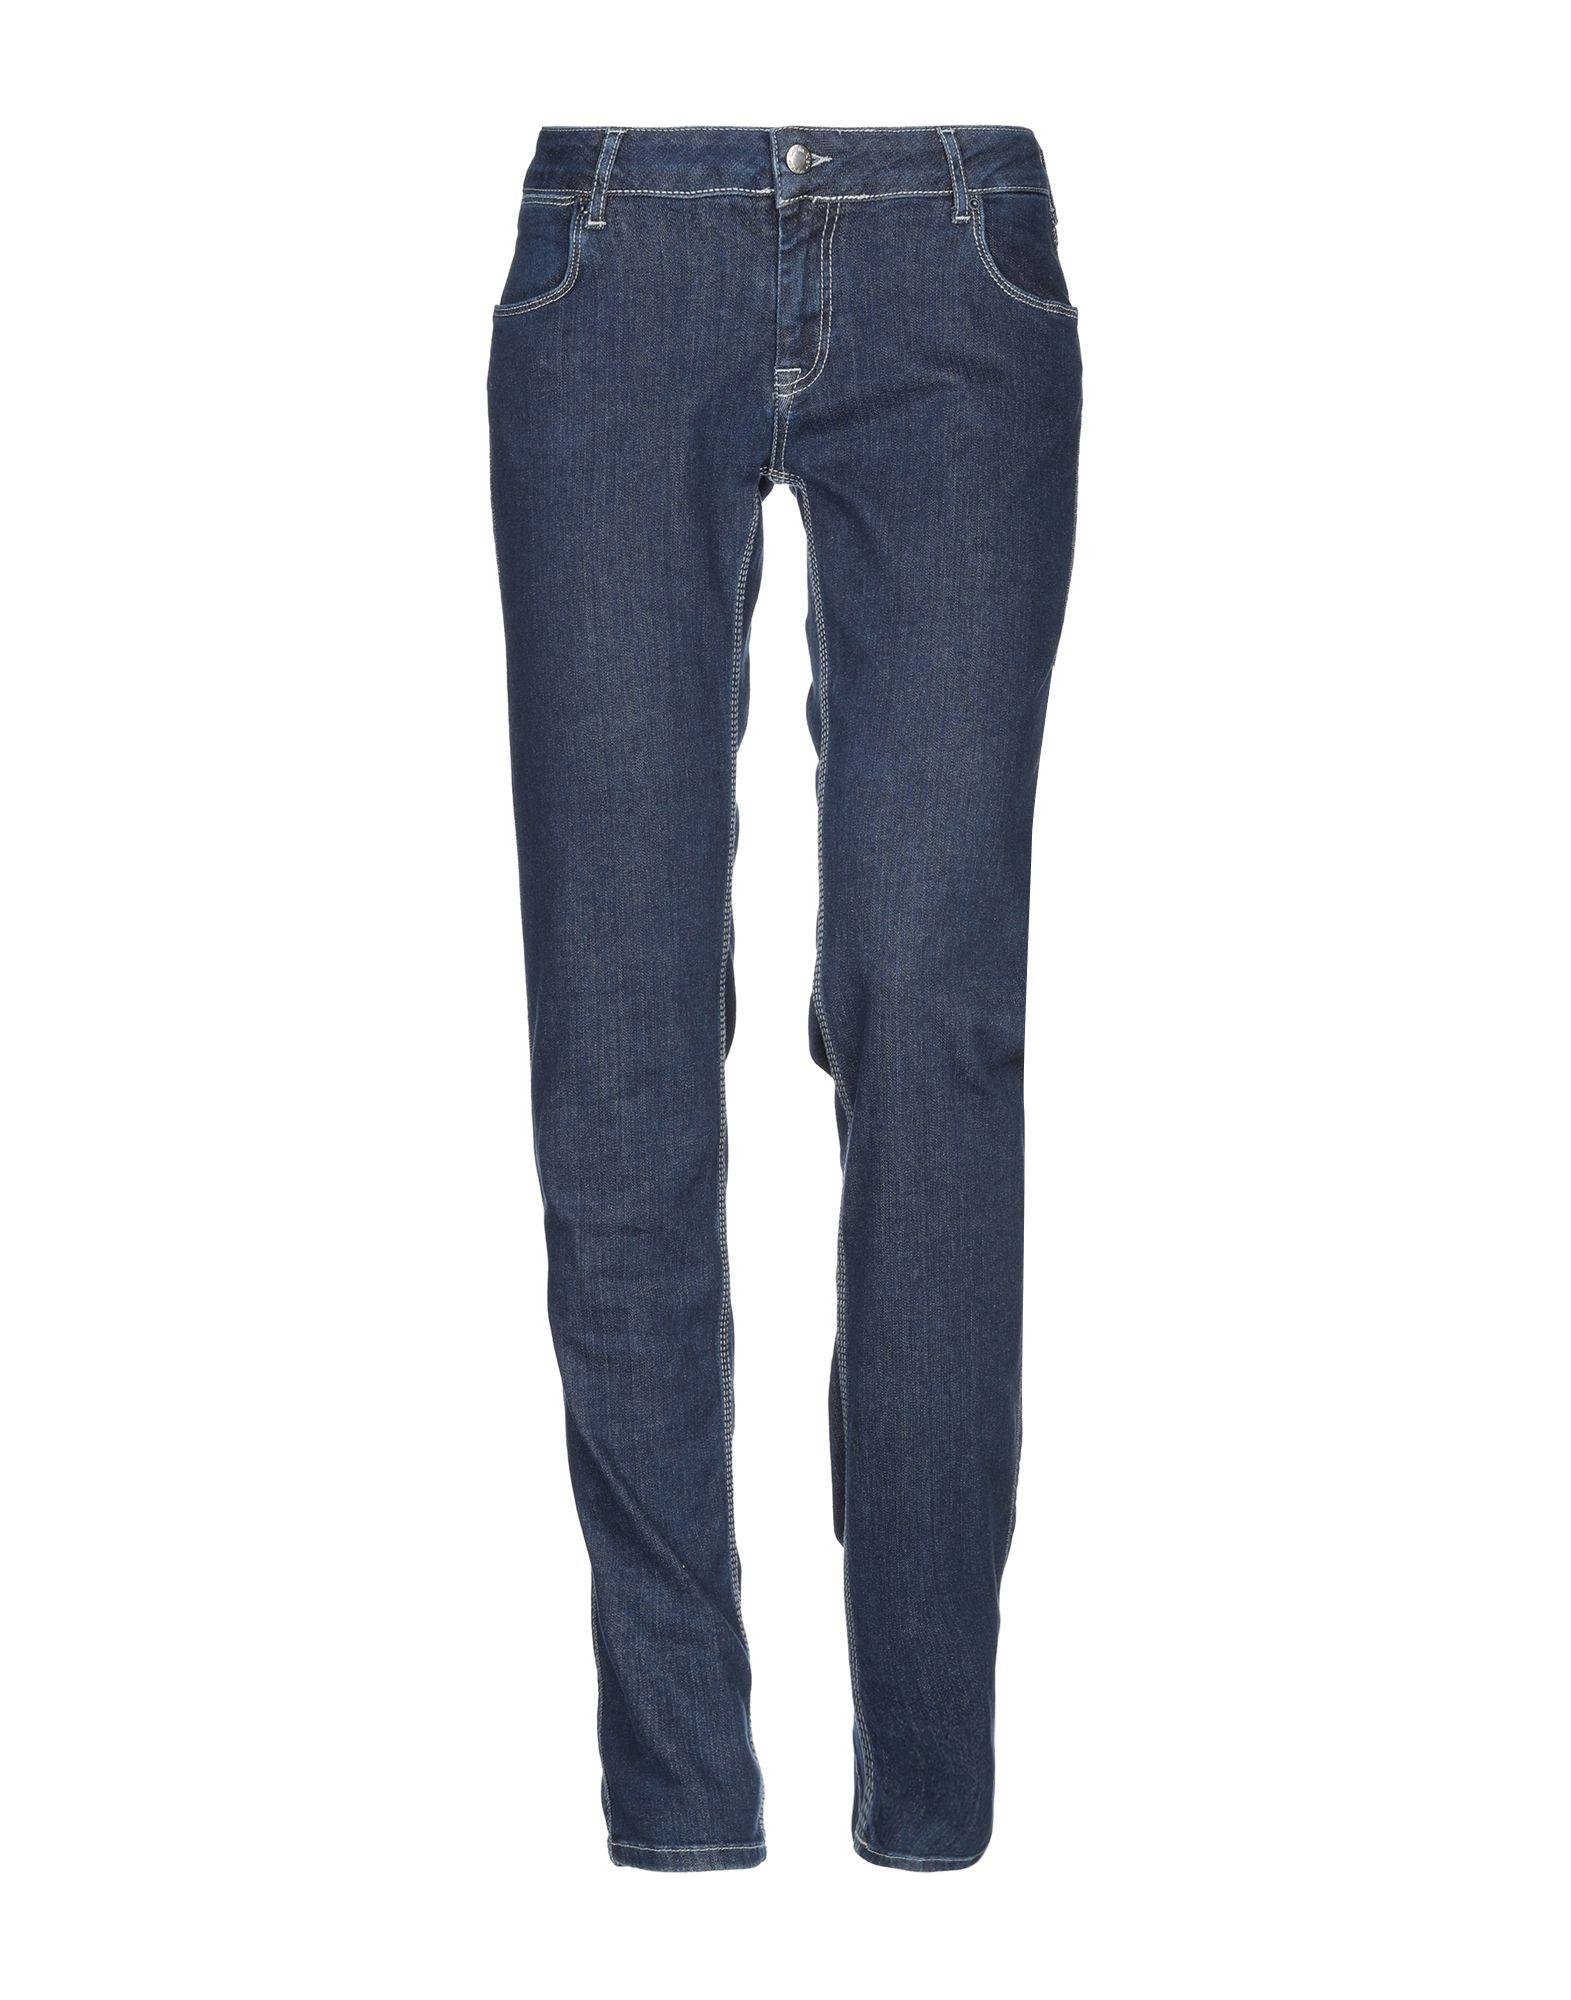 CALVIN KLEIN COLLECTION Джинсовые брюки calvin klein collection джинсовые брюки